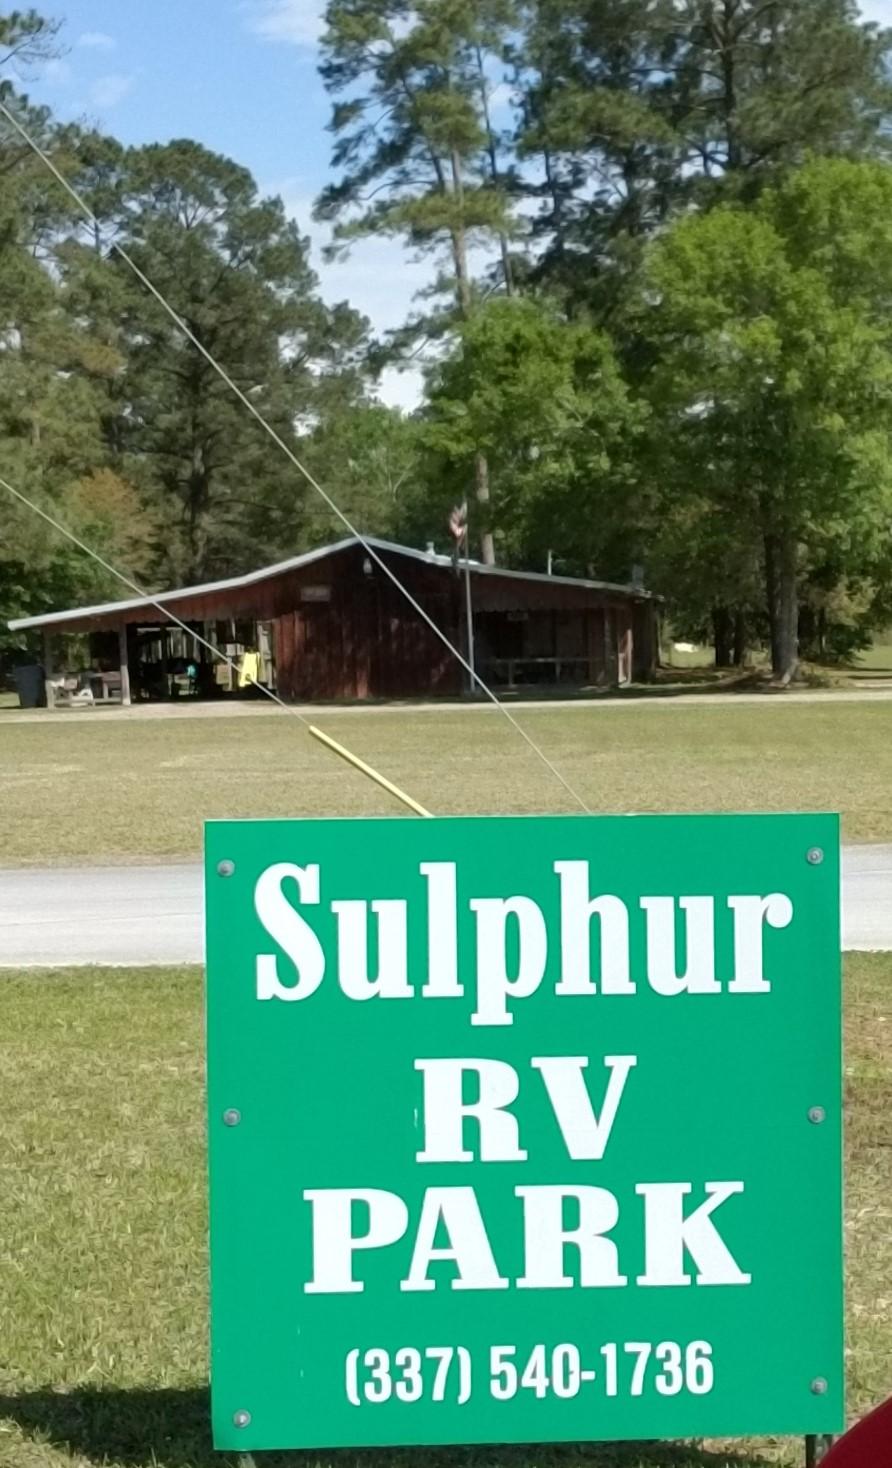 Sulphur RV Park